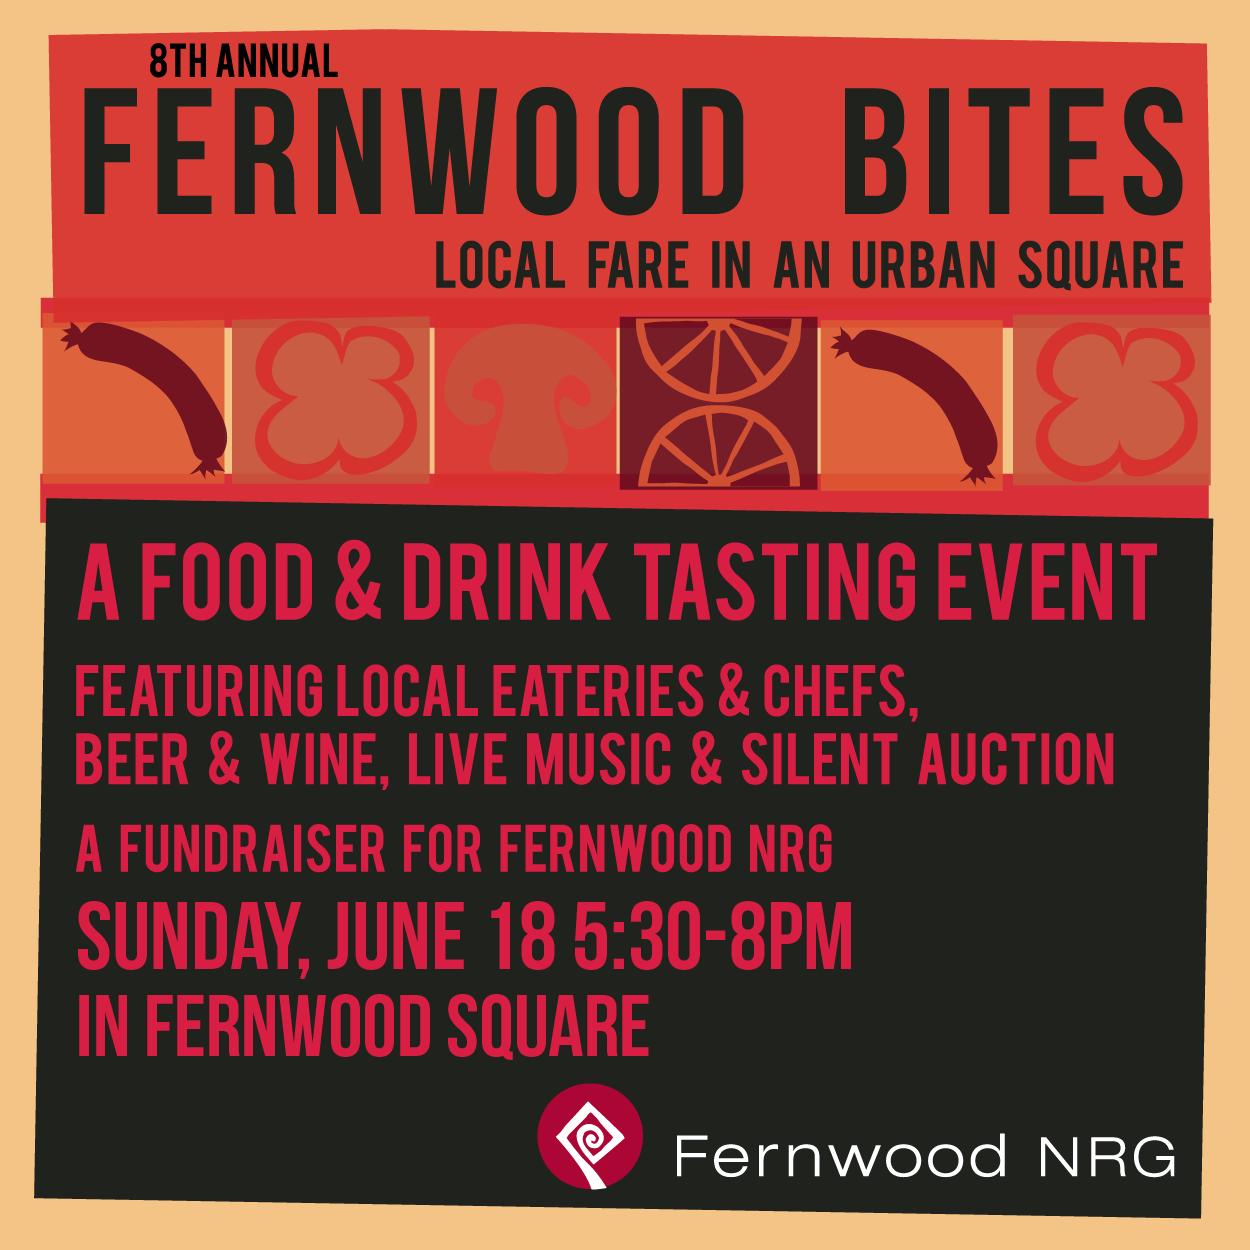 fernwood-bites